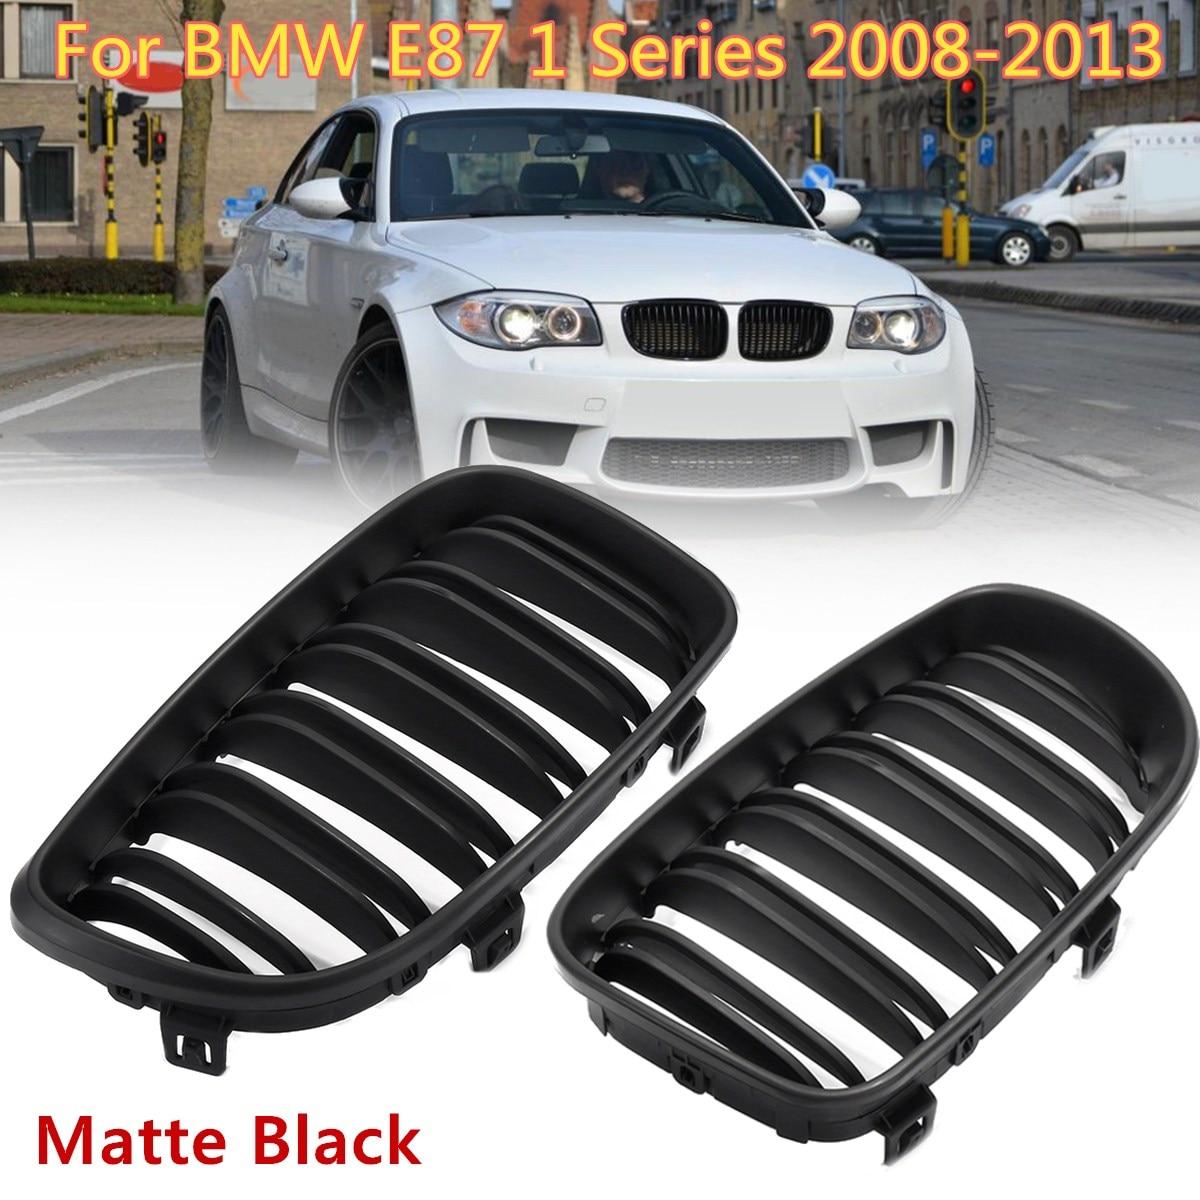 2Pcs Front Bumper Kidney Grill For BMW E81 E82 E87 E88 118i 125i 1 Series 2007 2013 Gloss Matt Black M 2 Slat Line Car Styling